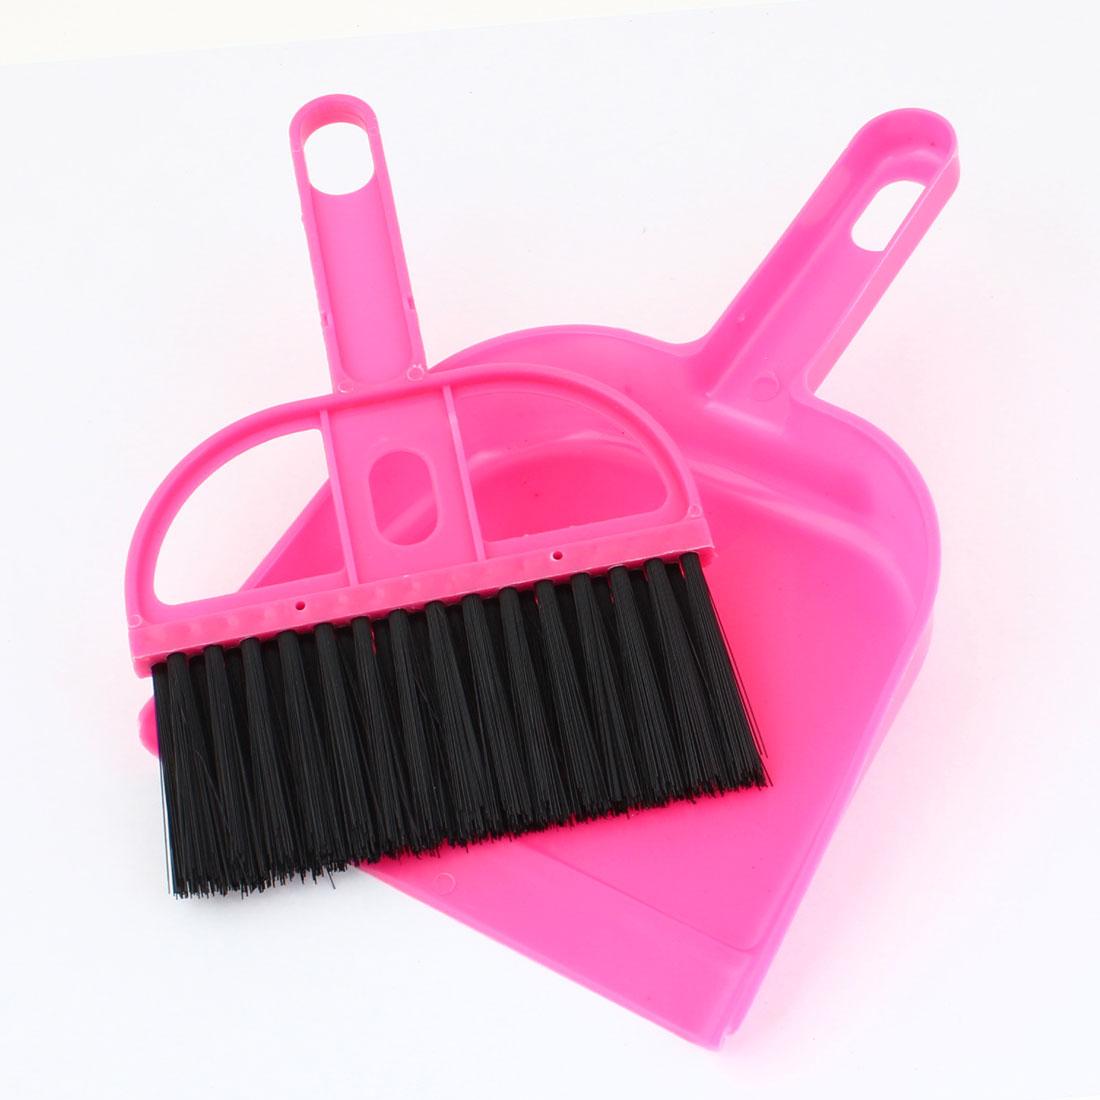 Mini Desk Cleaning Tool Black Fushsia Plastic Broom Dustpan Set